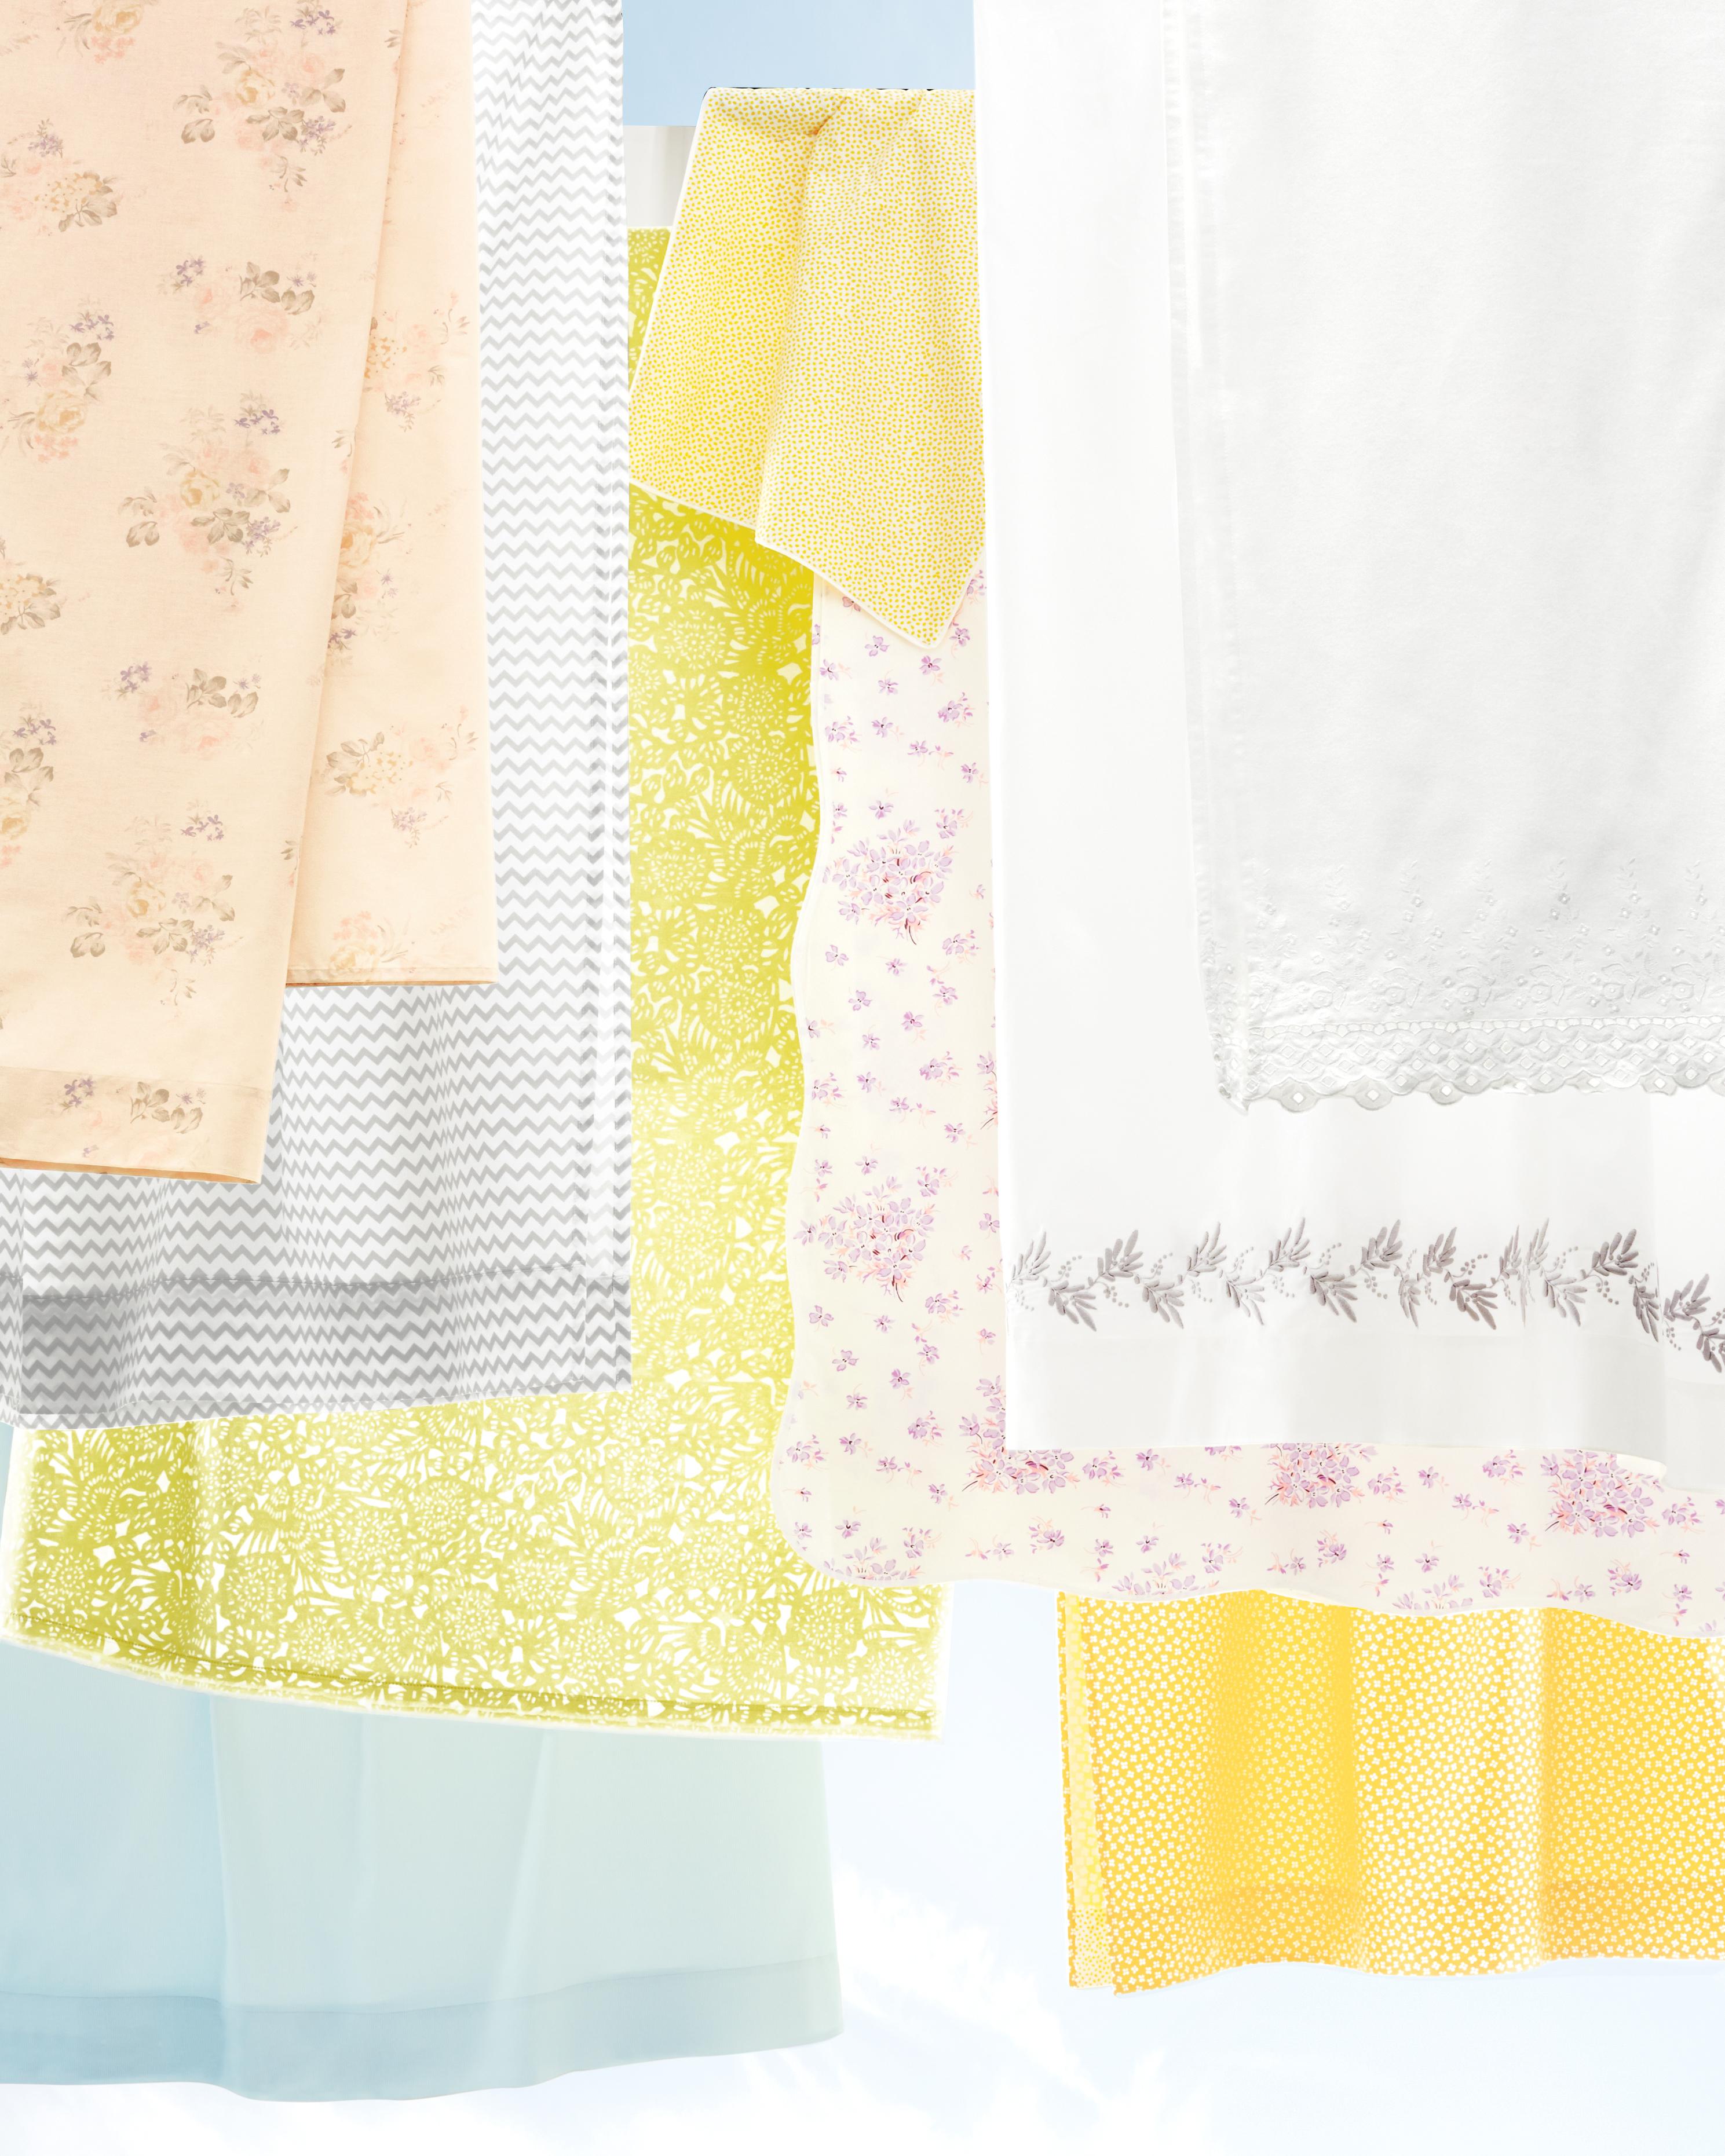 bedding-sheets-pillowcases-361-d111040-comp.jpg